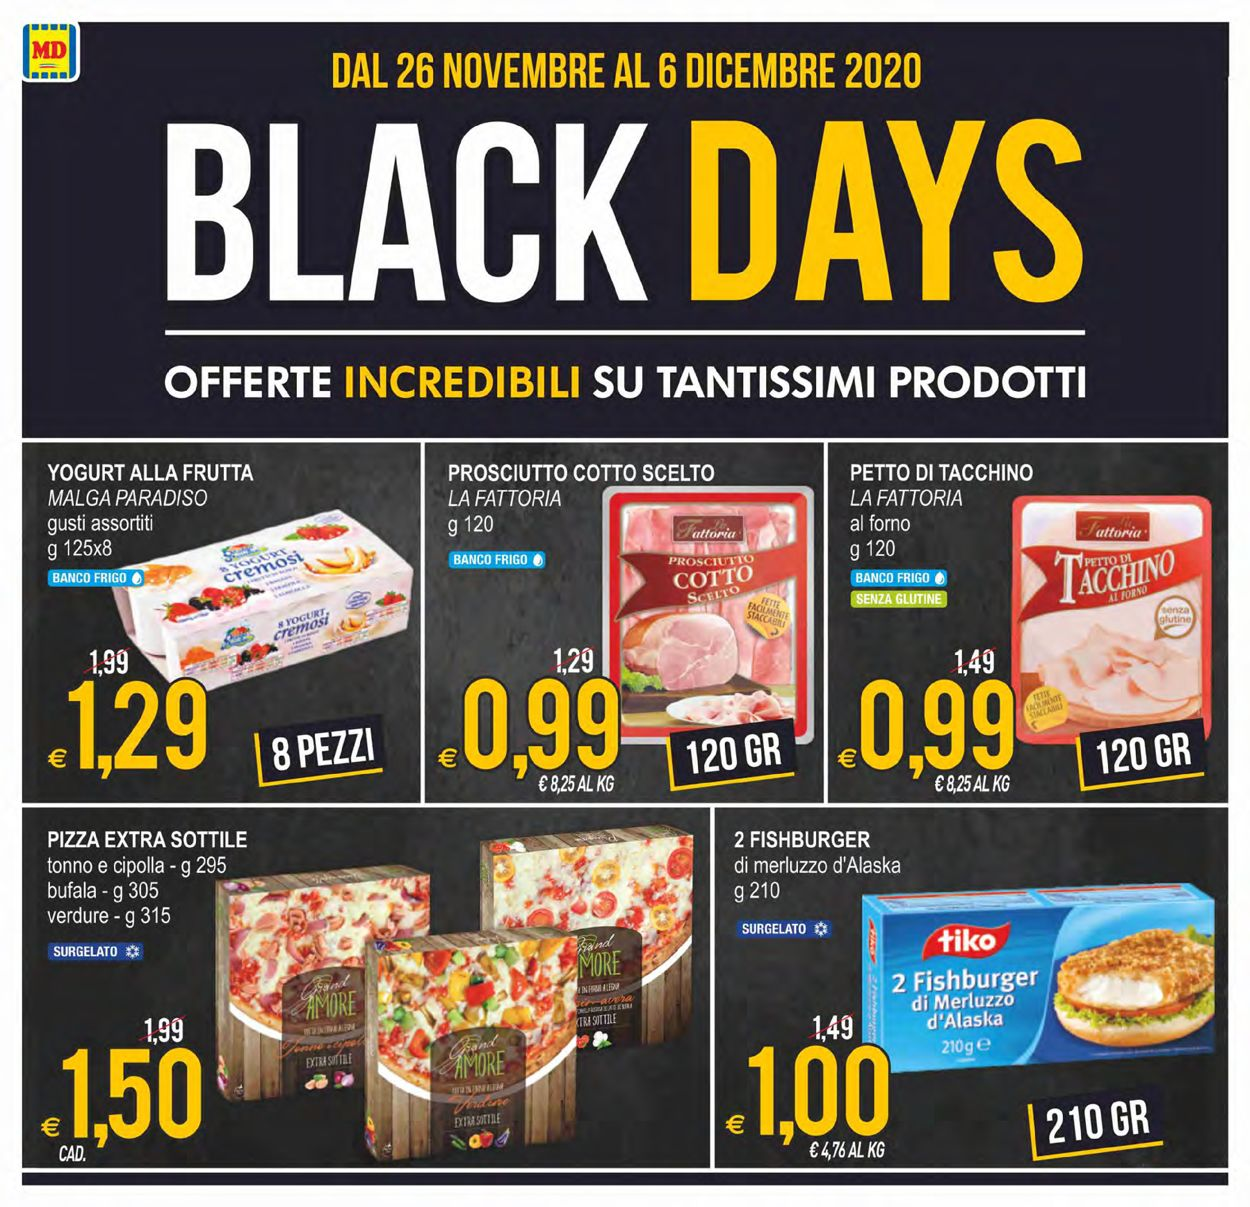 Volantino MD Discount - Black Friday 2020 - Offerte 26/11-06/12/2020 (Pagina 2)